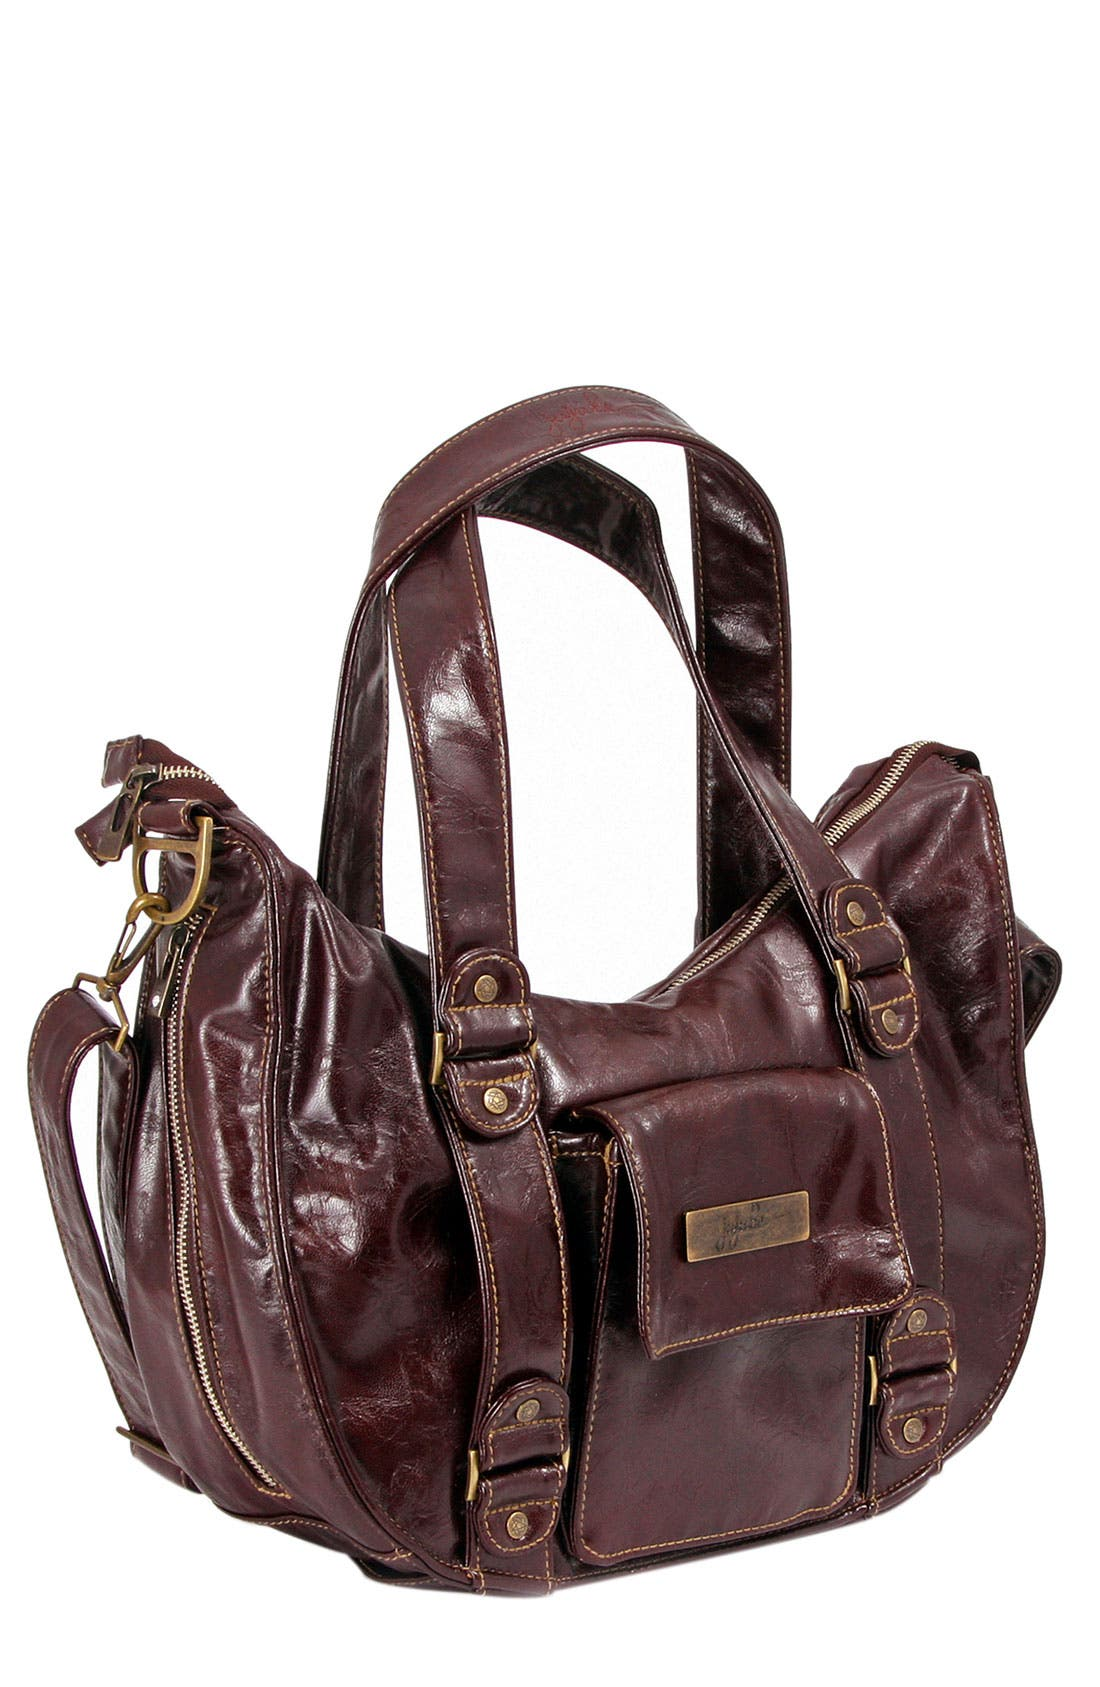 Main Image - Ju-Ju-Be 'Legacy' Earth Leather™ Faux Leather Diaper Bag